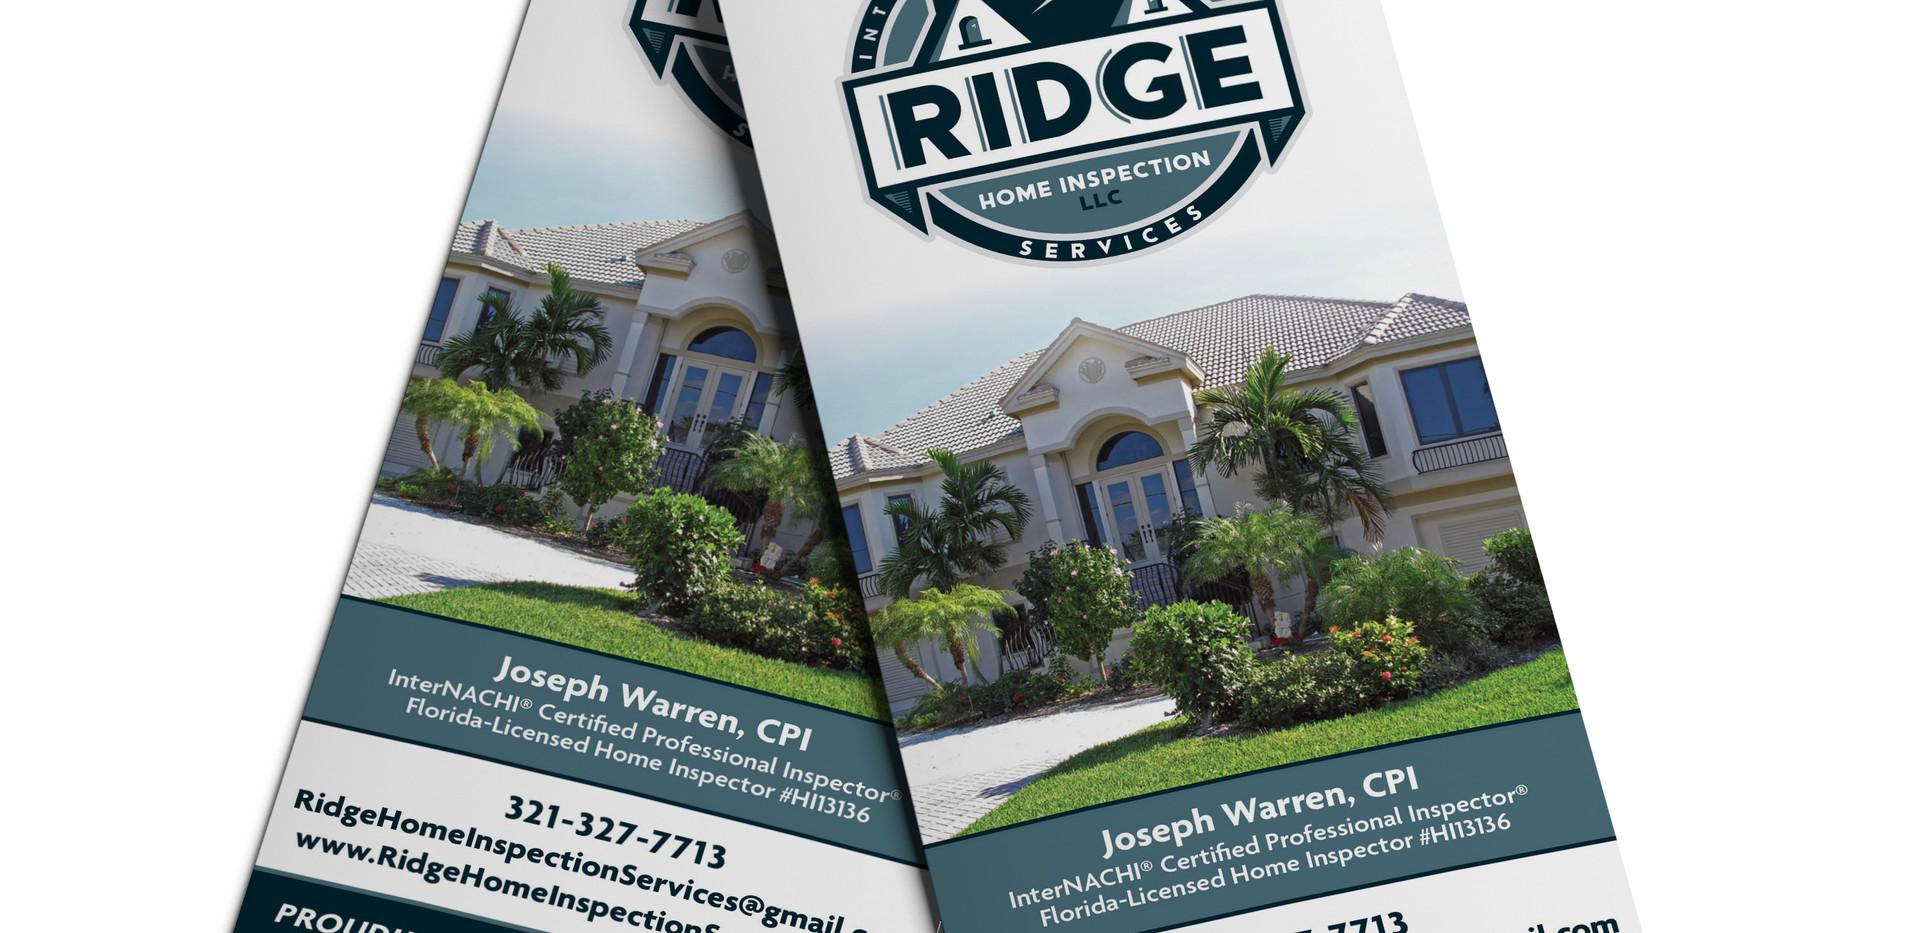 Ridge Home Inspections